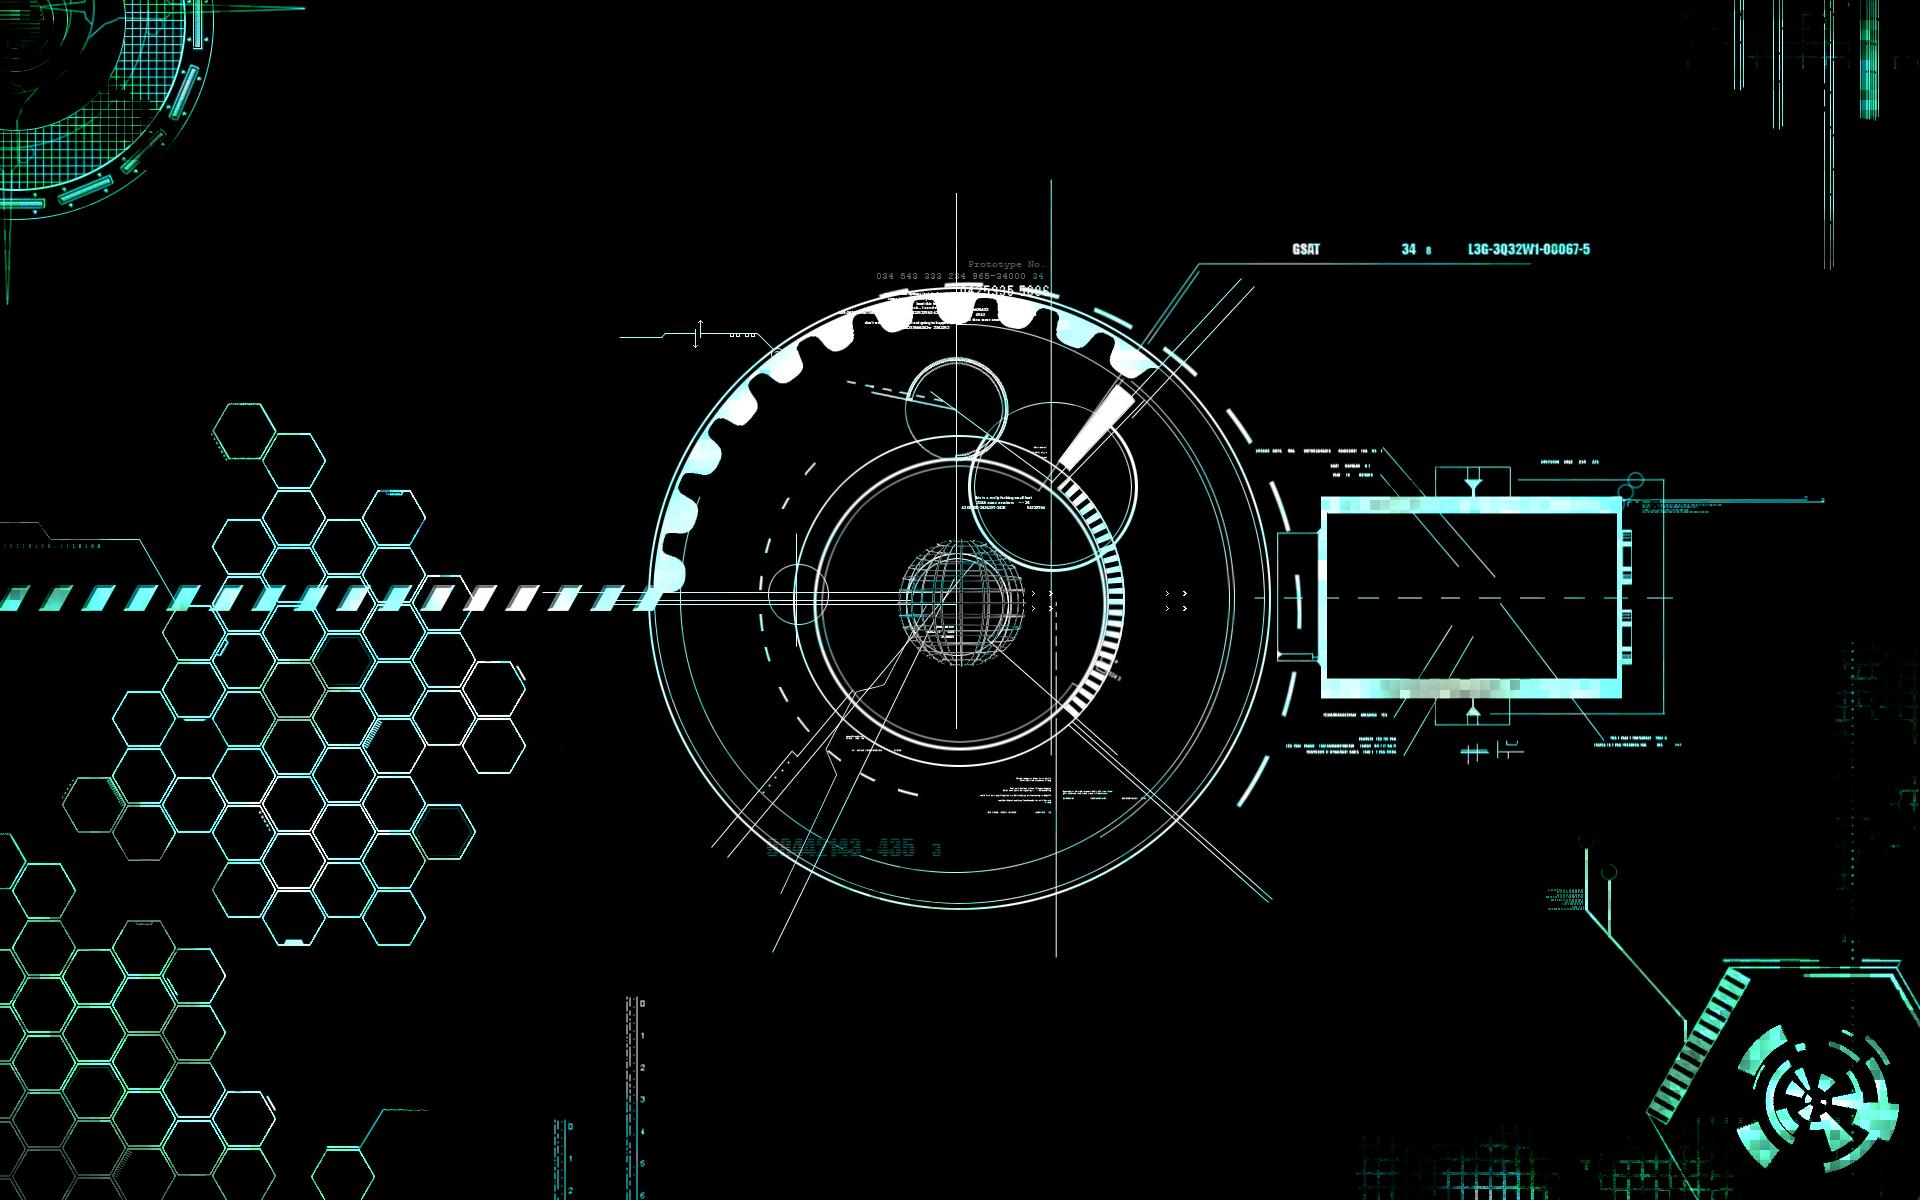 Hd wallpaper vector - Technology Images